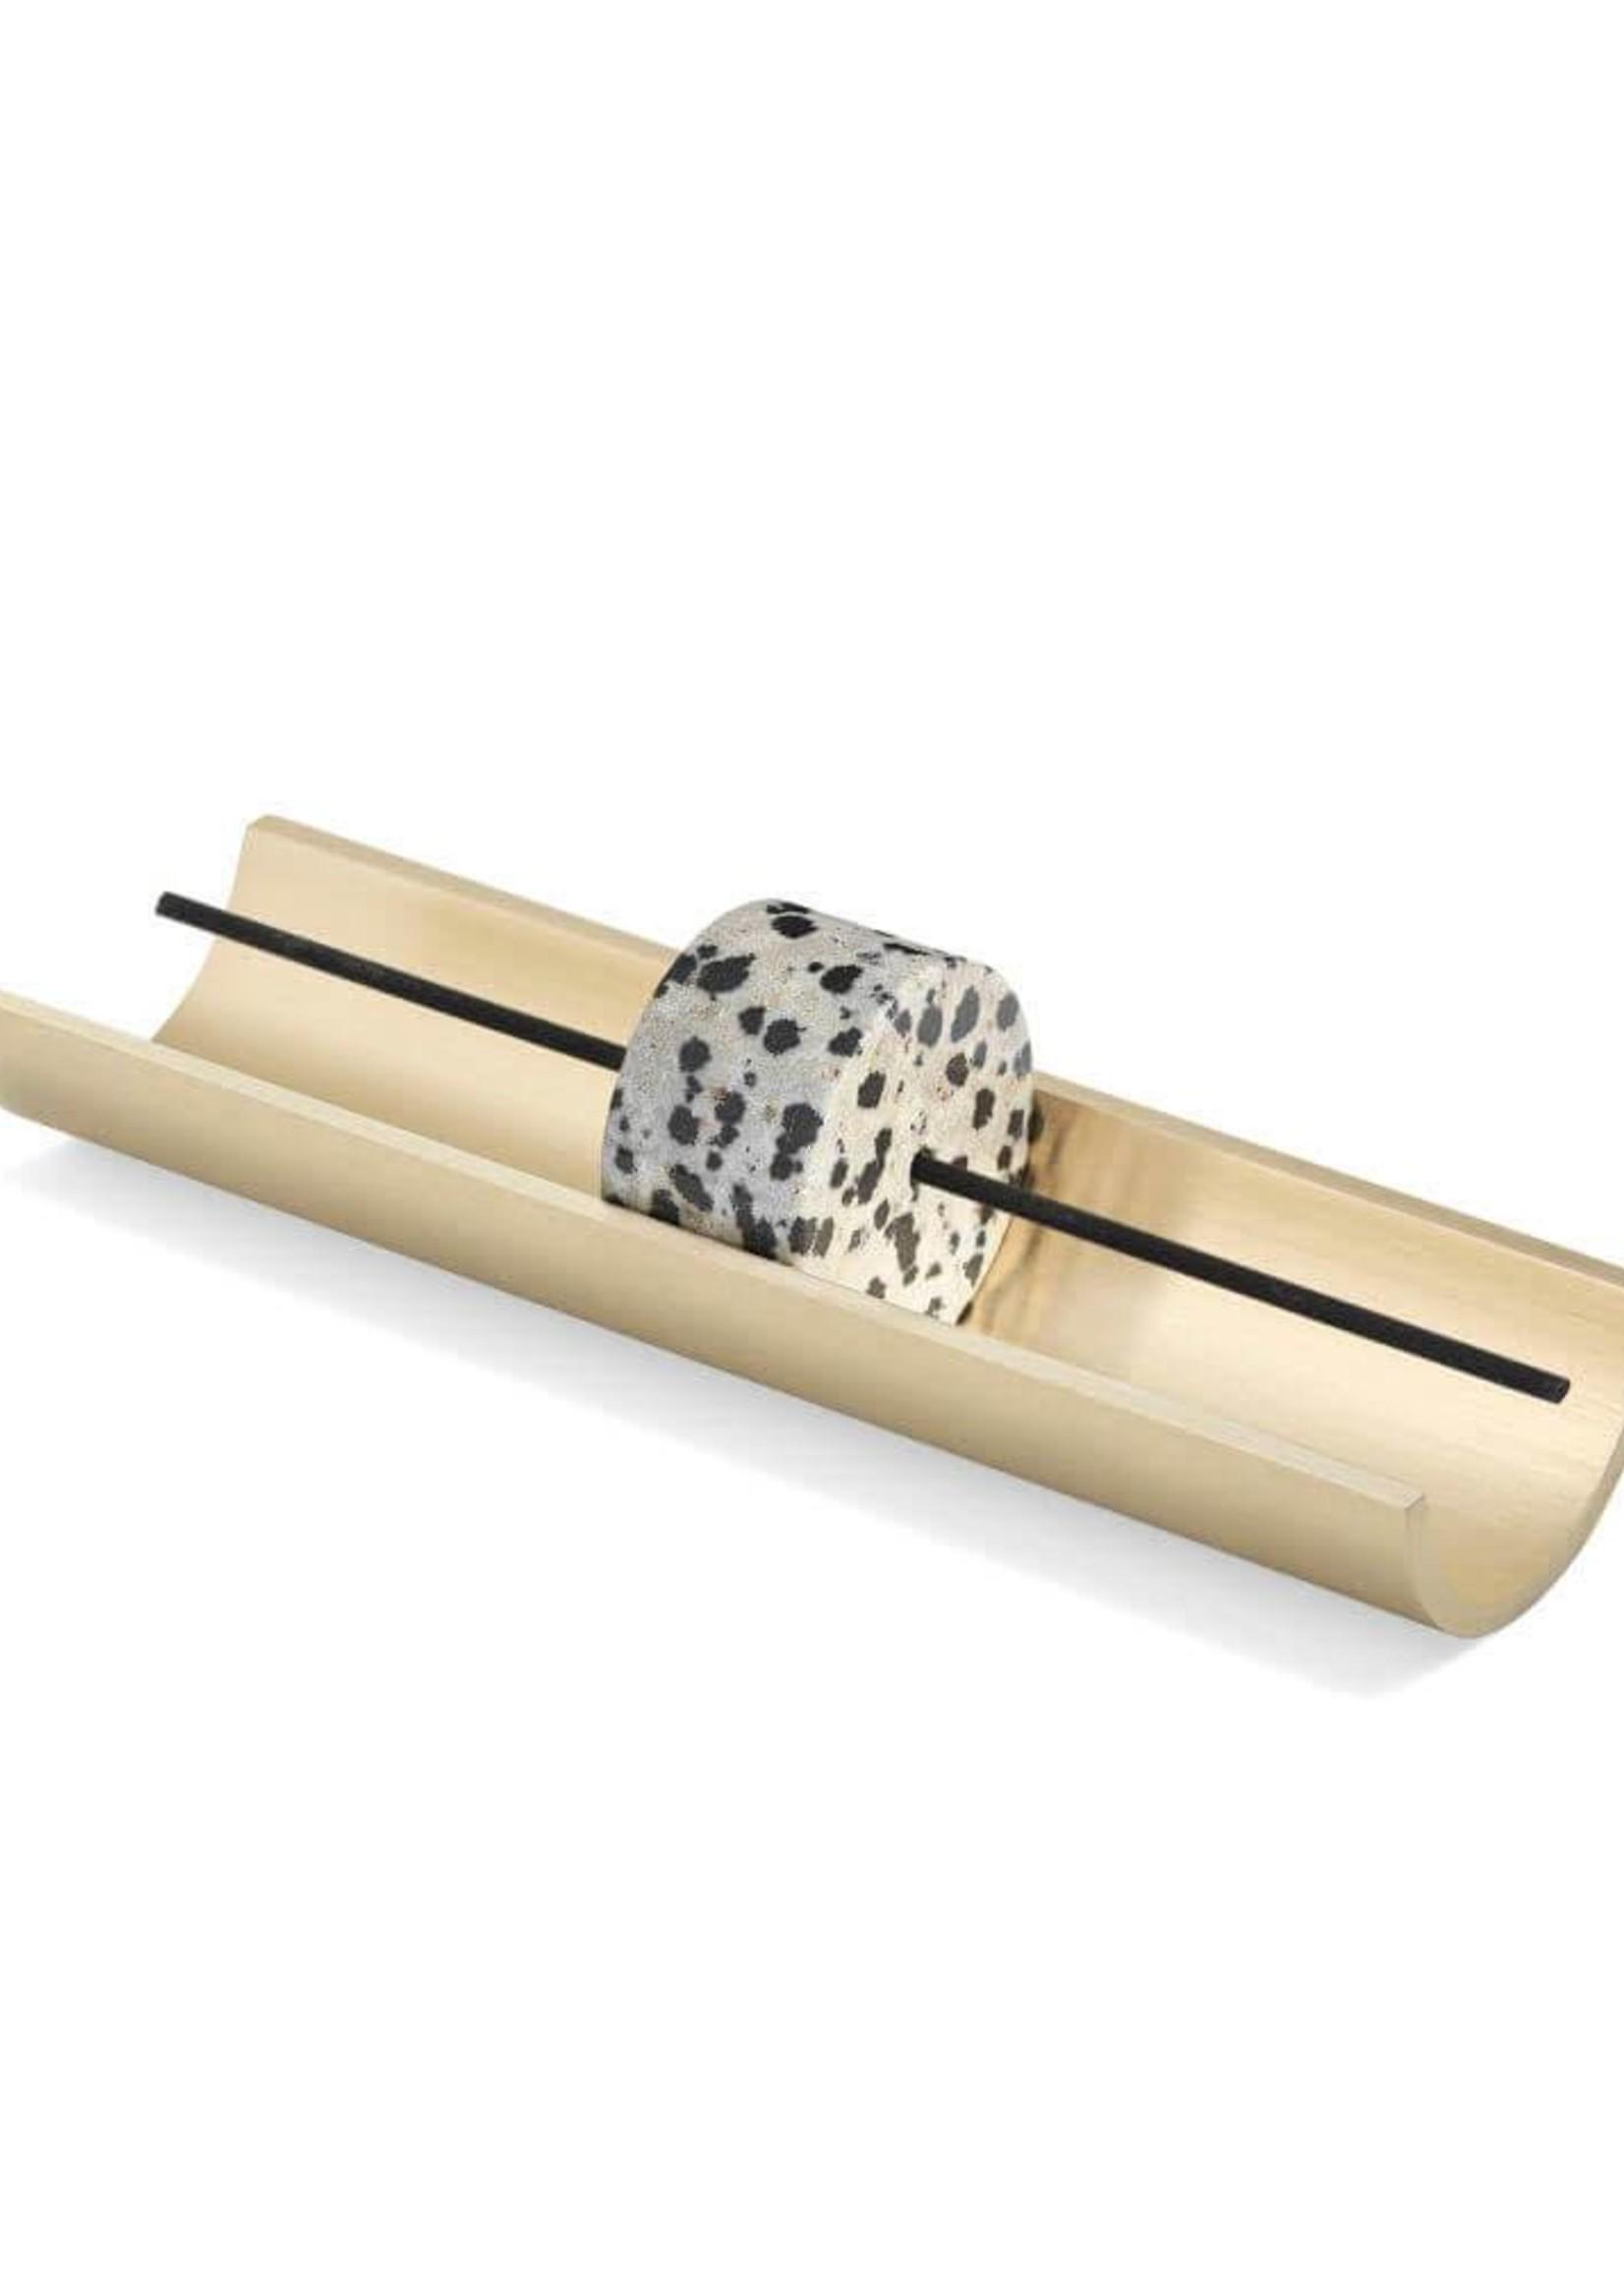 Circa Incense Burner: Dalmatian Stone